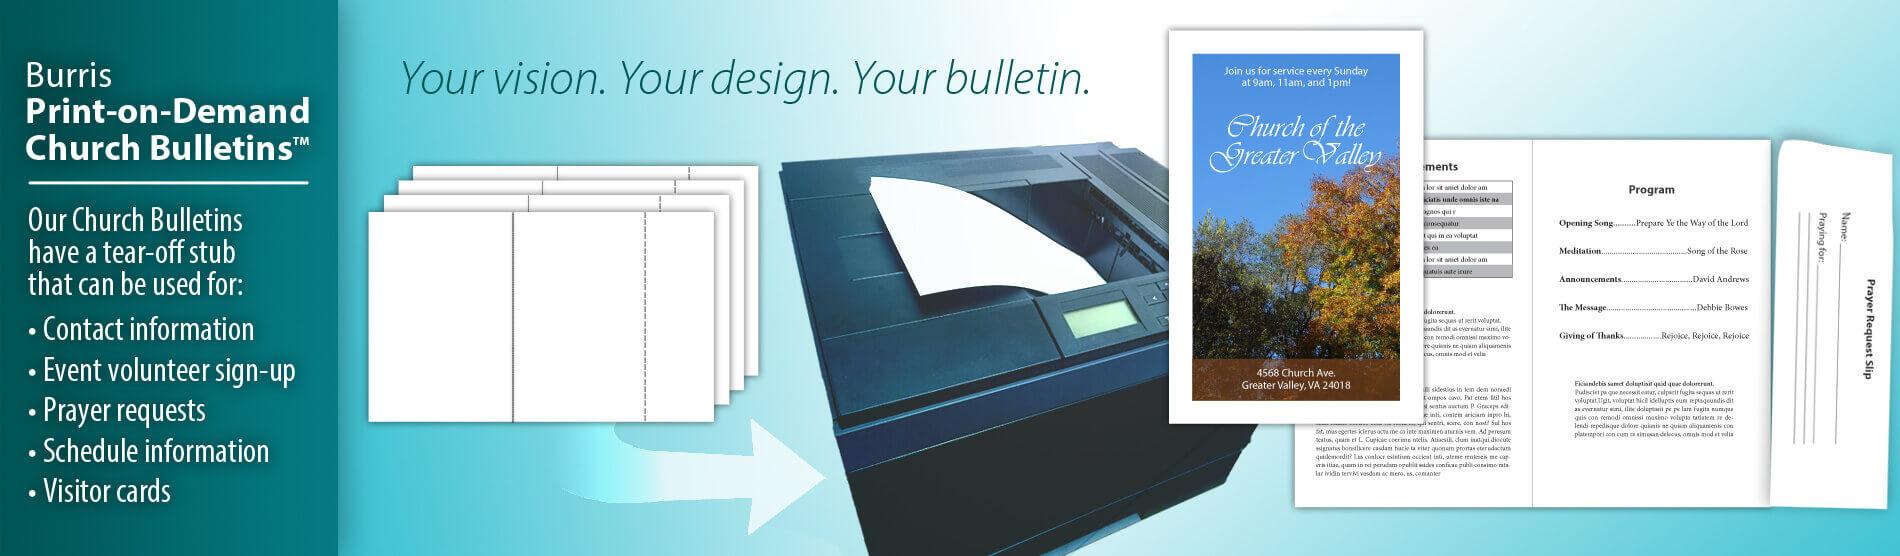 blank church bulletins printable church bulletins